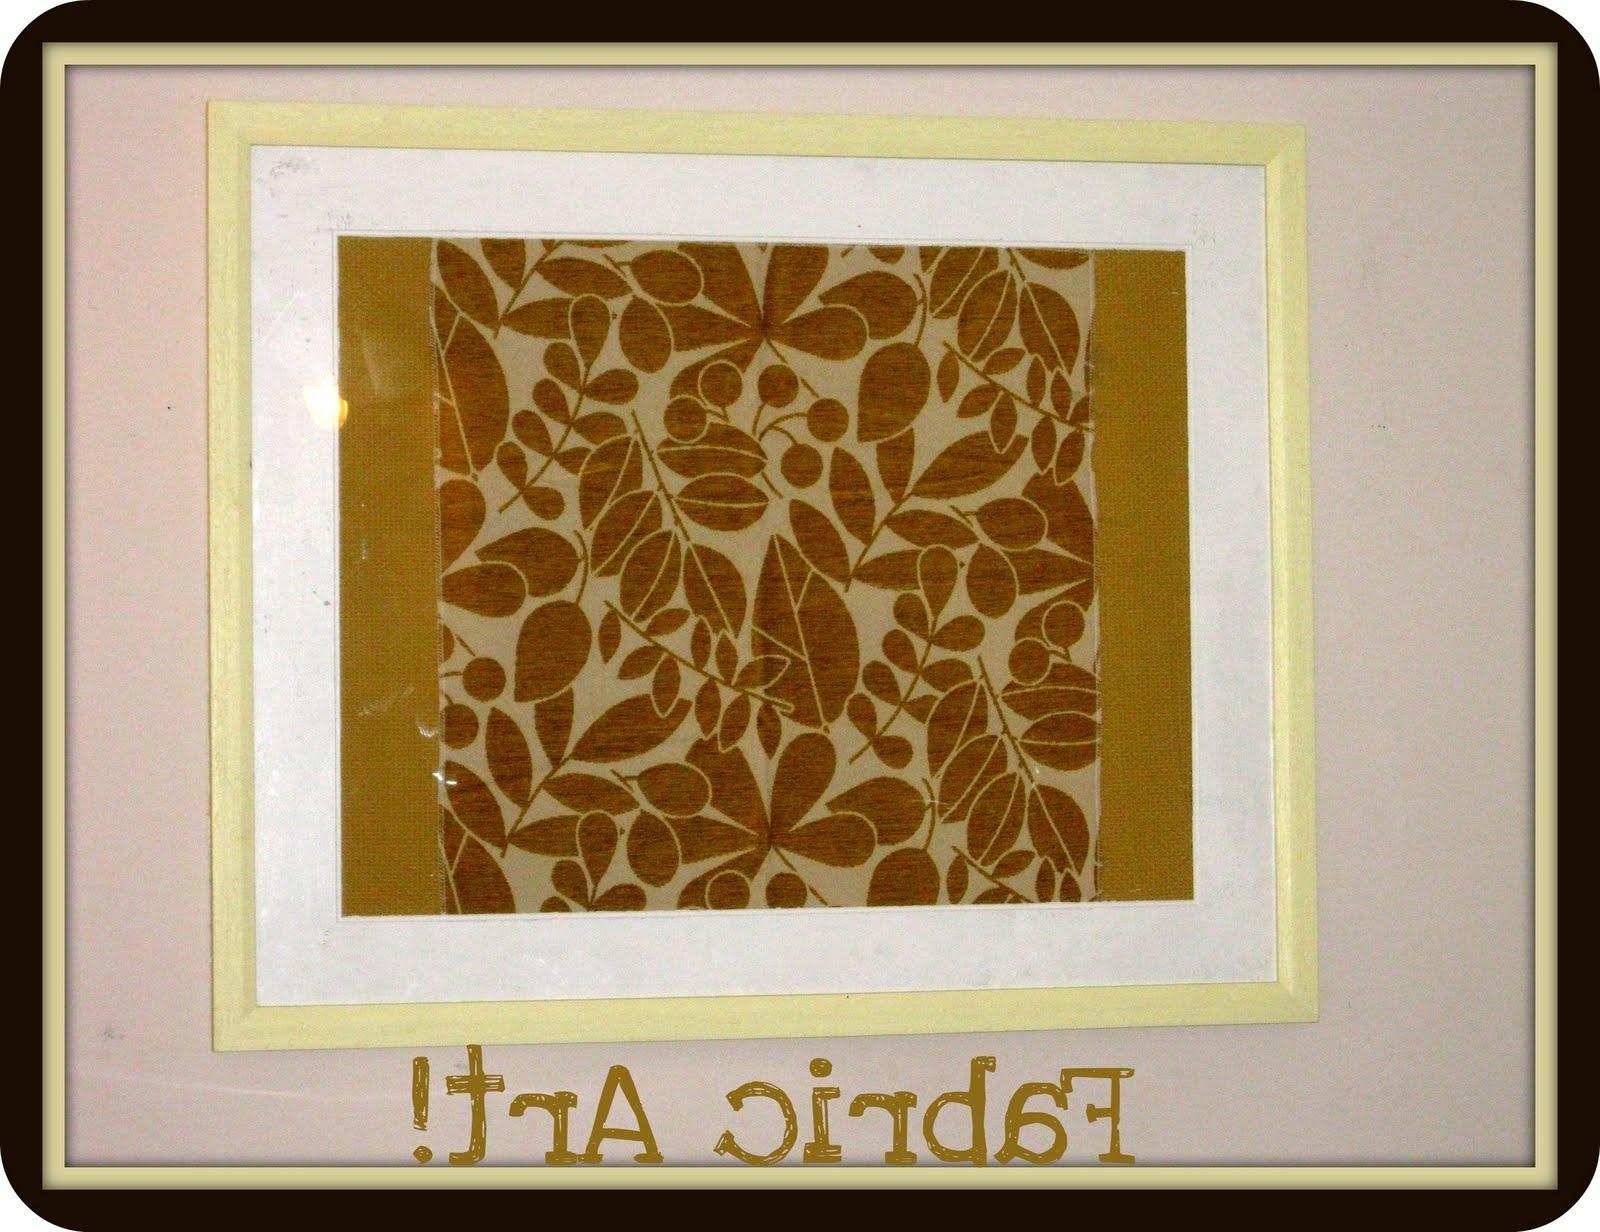 Framed Fabric Wall Art E2 80 94 Crafthubs Cheap Simple Diy Within Most Current Simple Fabric Wall Art (View 3 of 15)